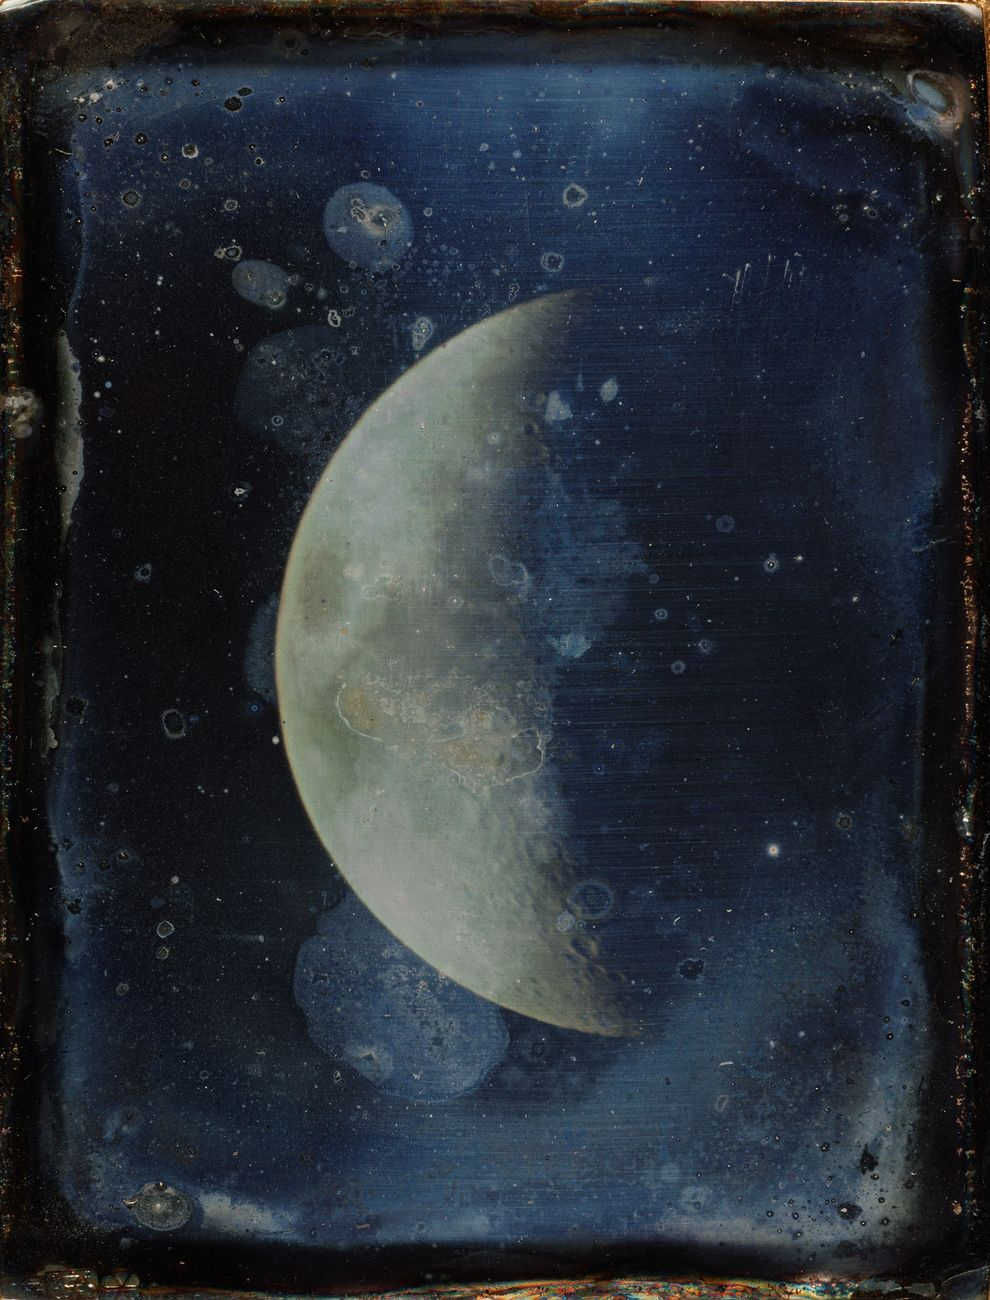 John Adams Whipple, View of the Moon, 1852